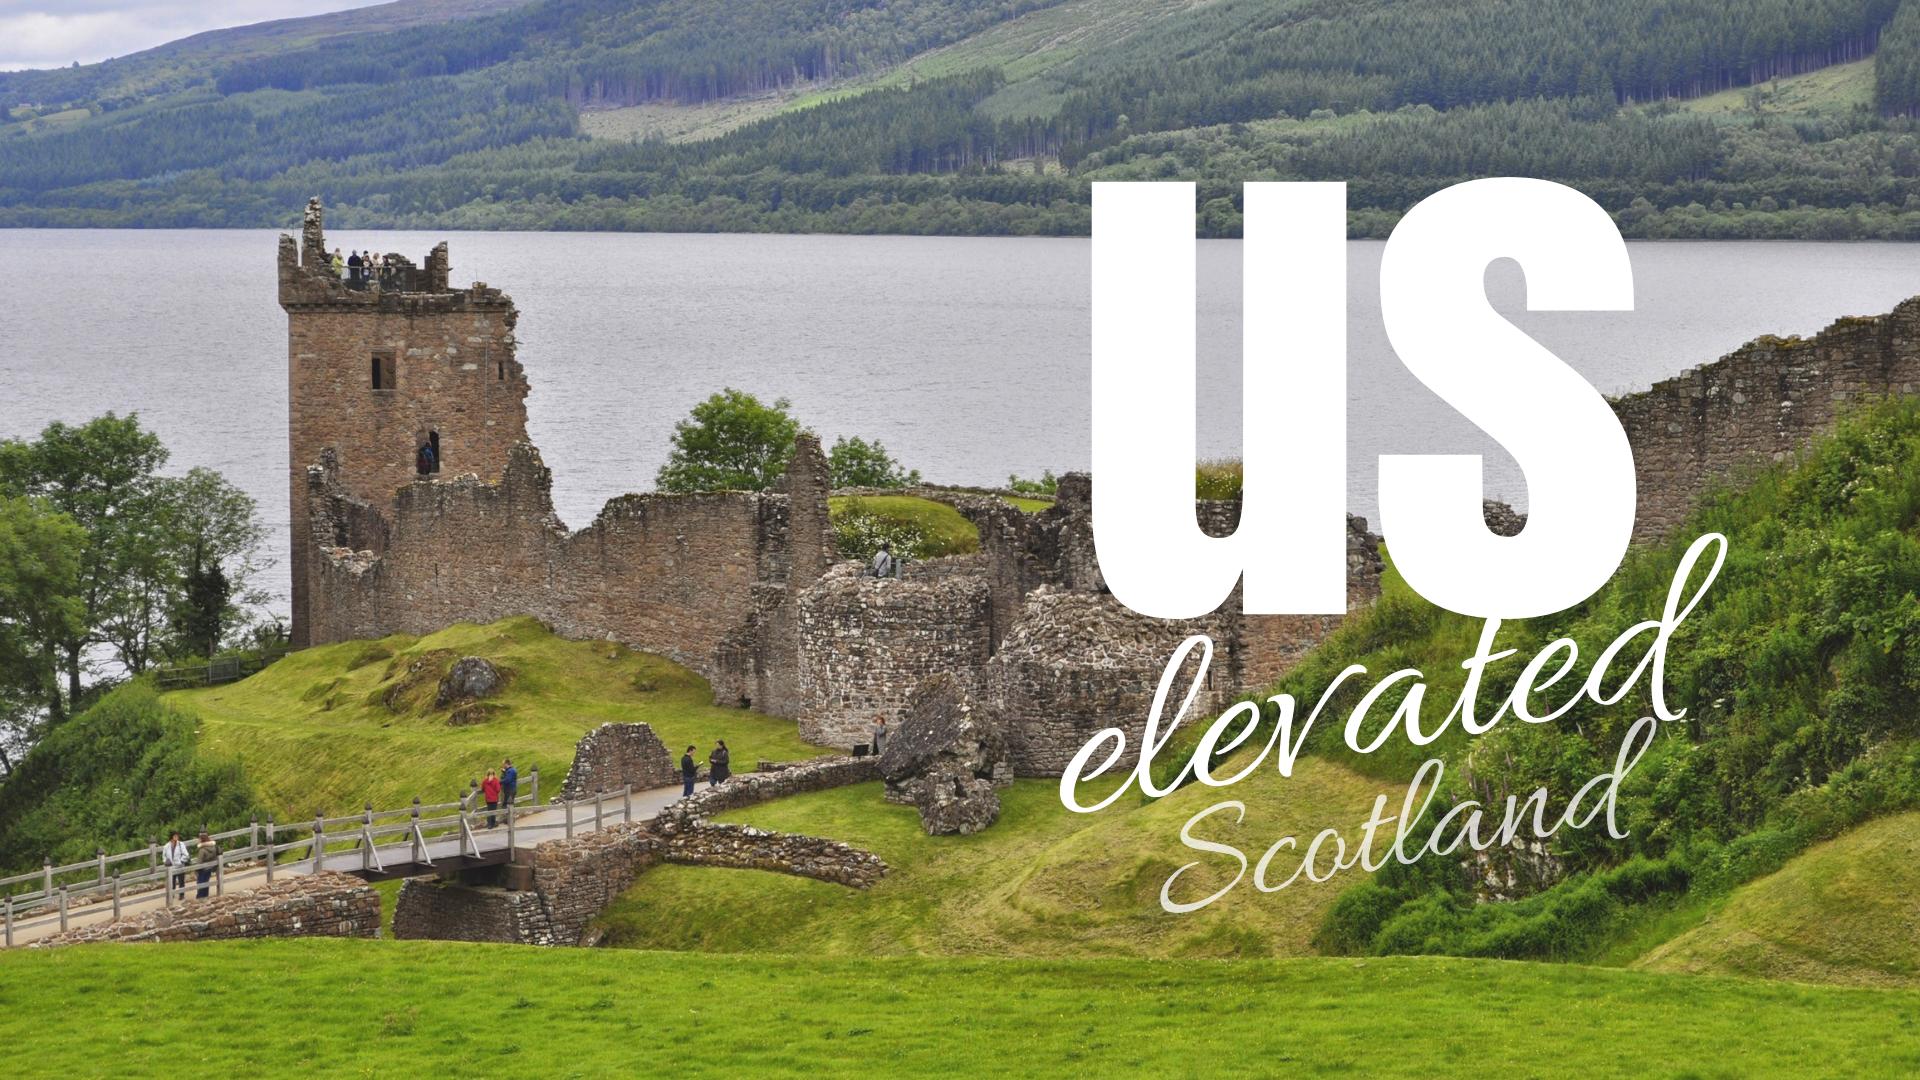 Us Elevated Scotland